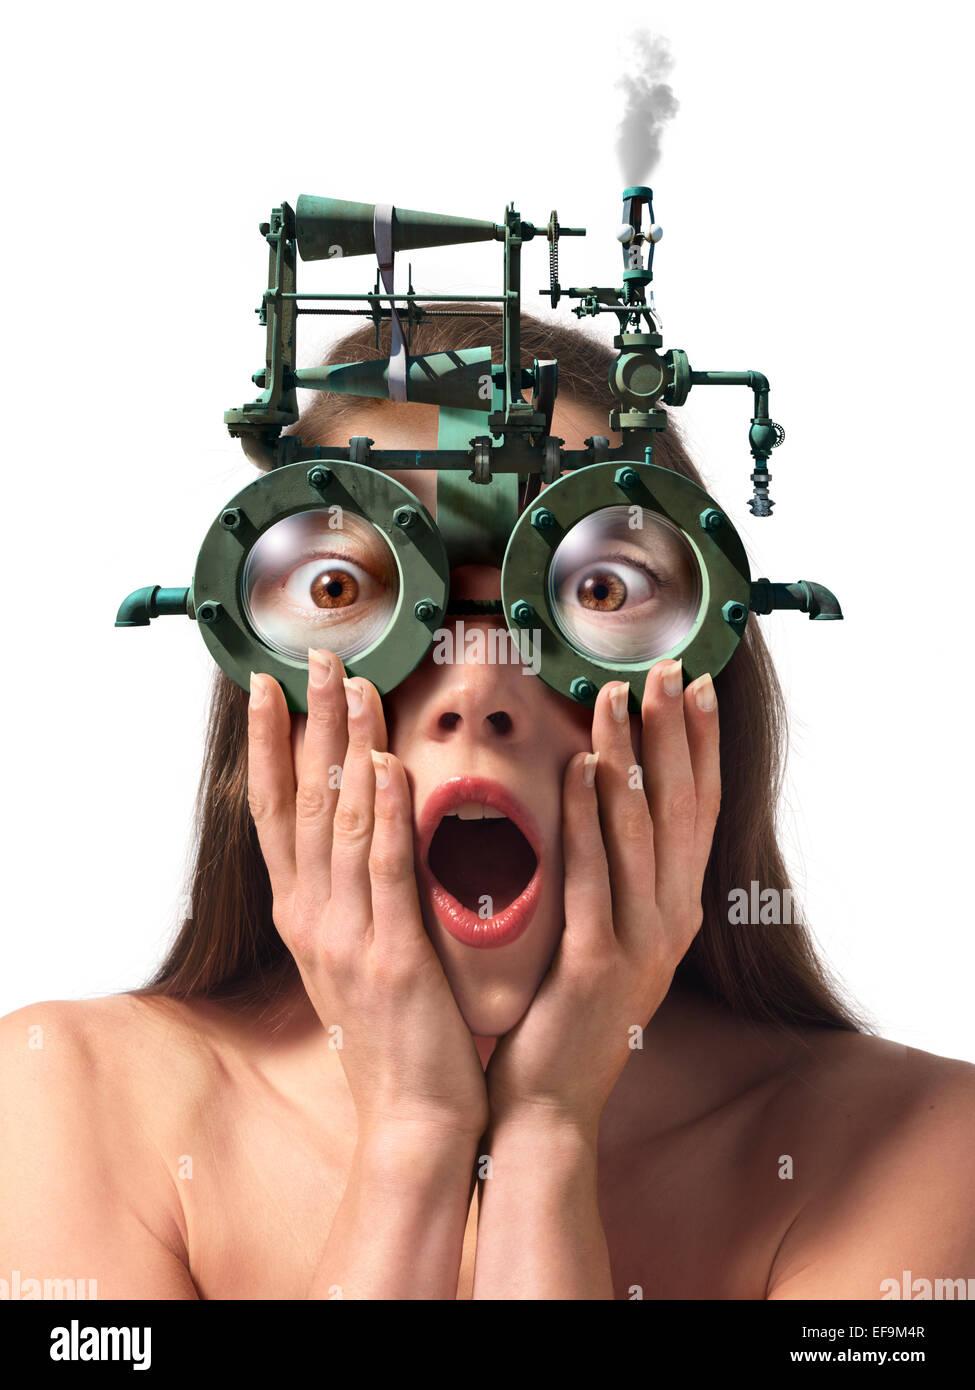 Fantasy image of woman wearing steam powered eyeglasses - Stock Image